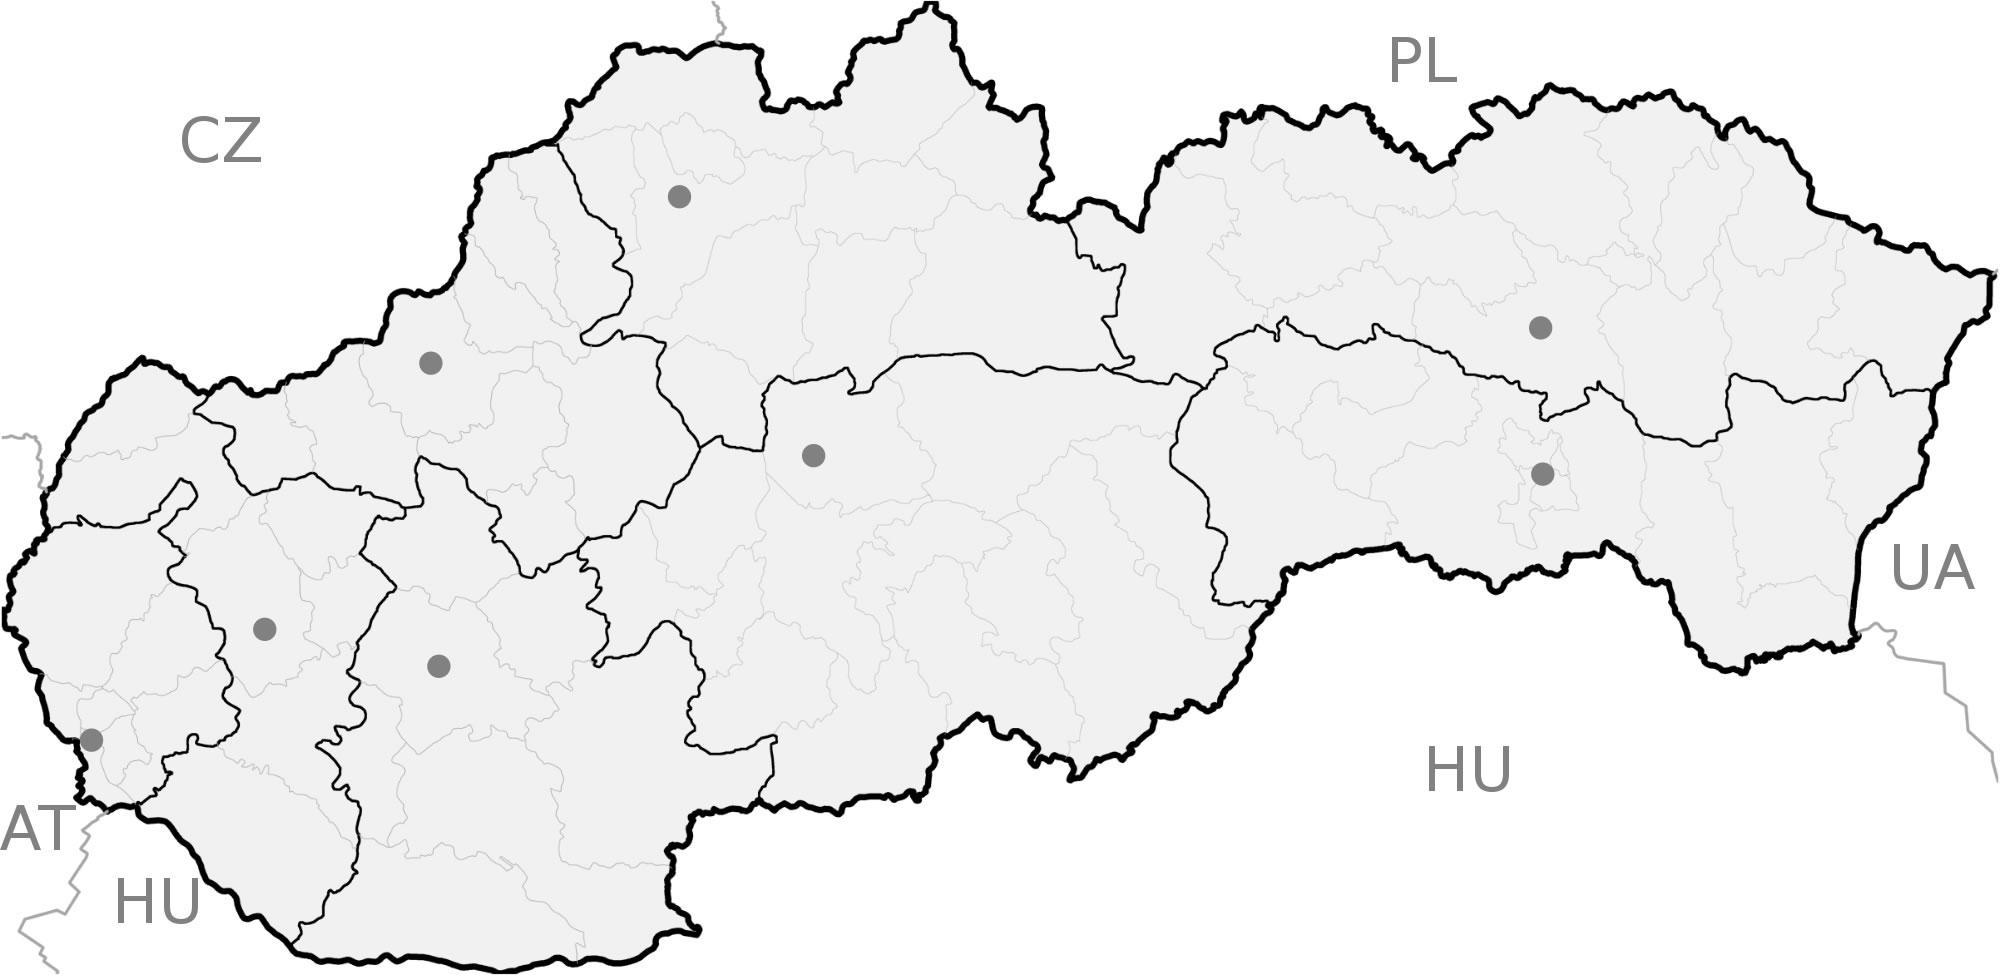 Carte Slovaquie Vierge Régions, Carte Vierge Des Régions De pour Carte Des Régions Vierge